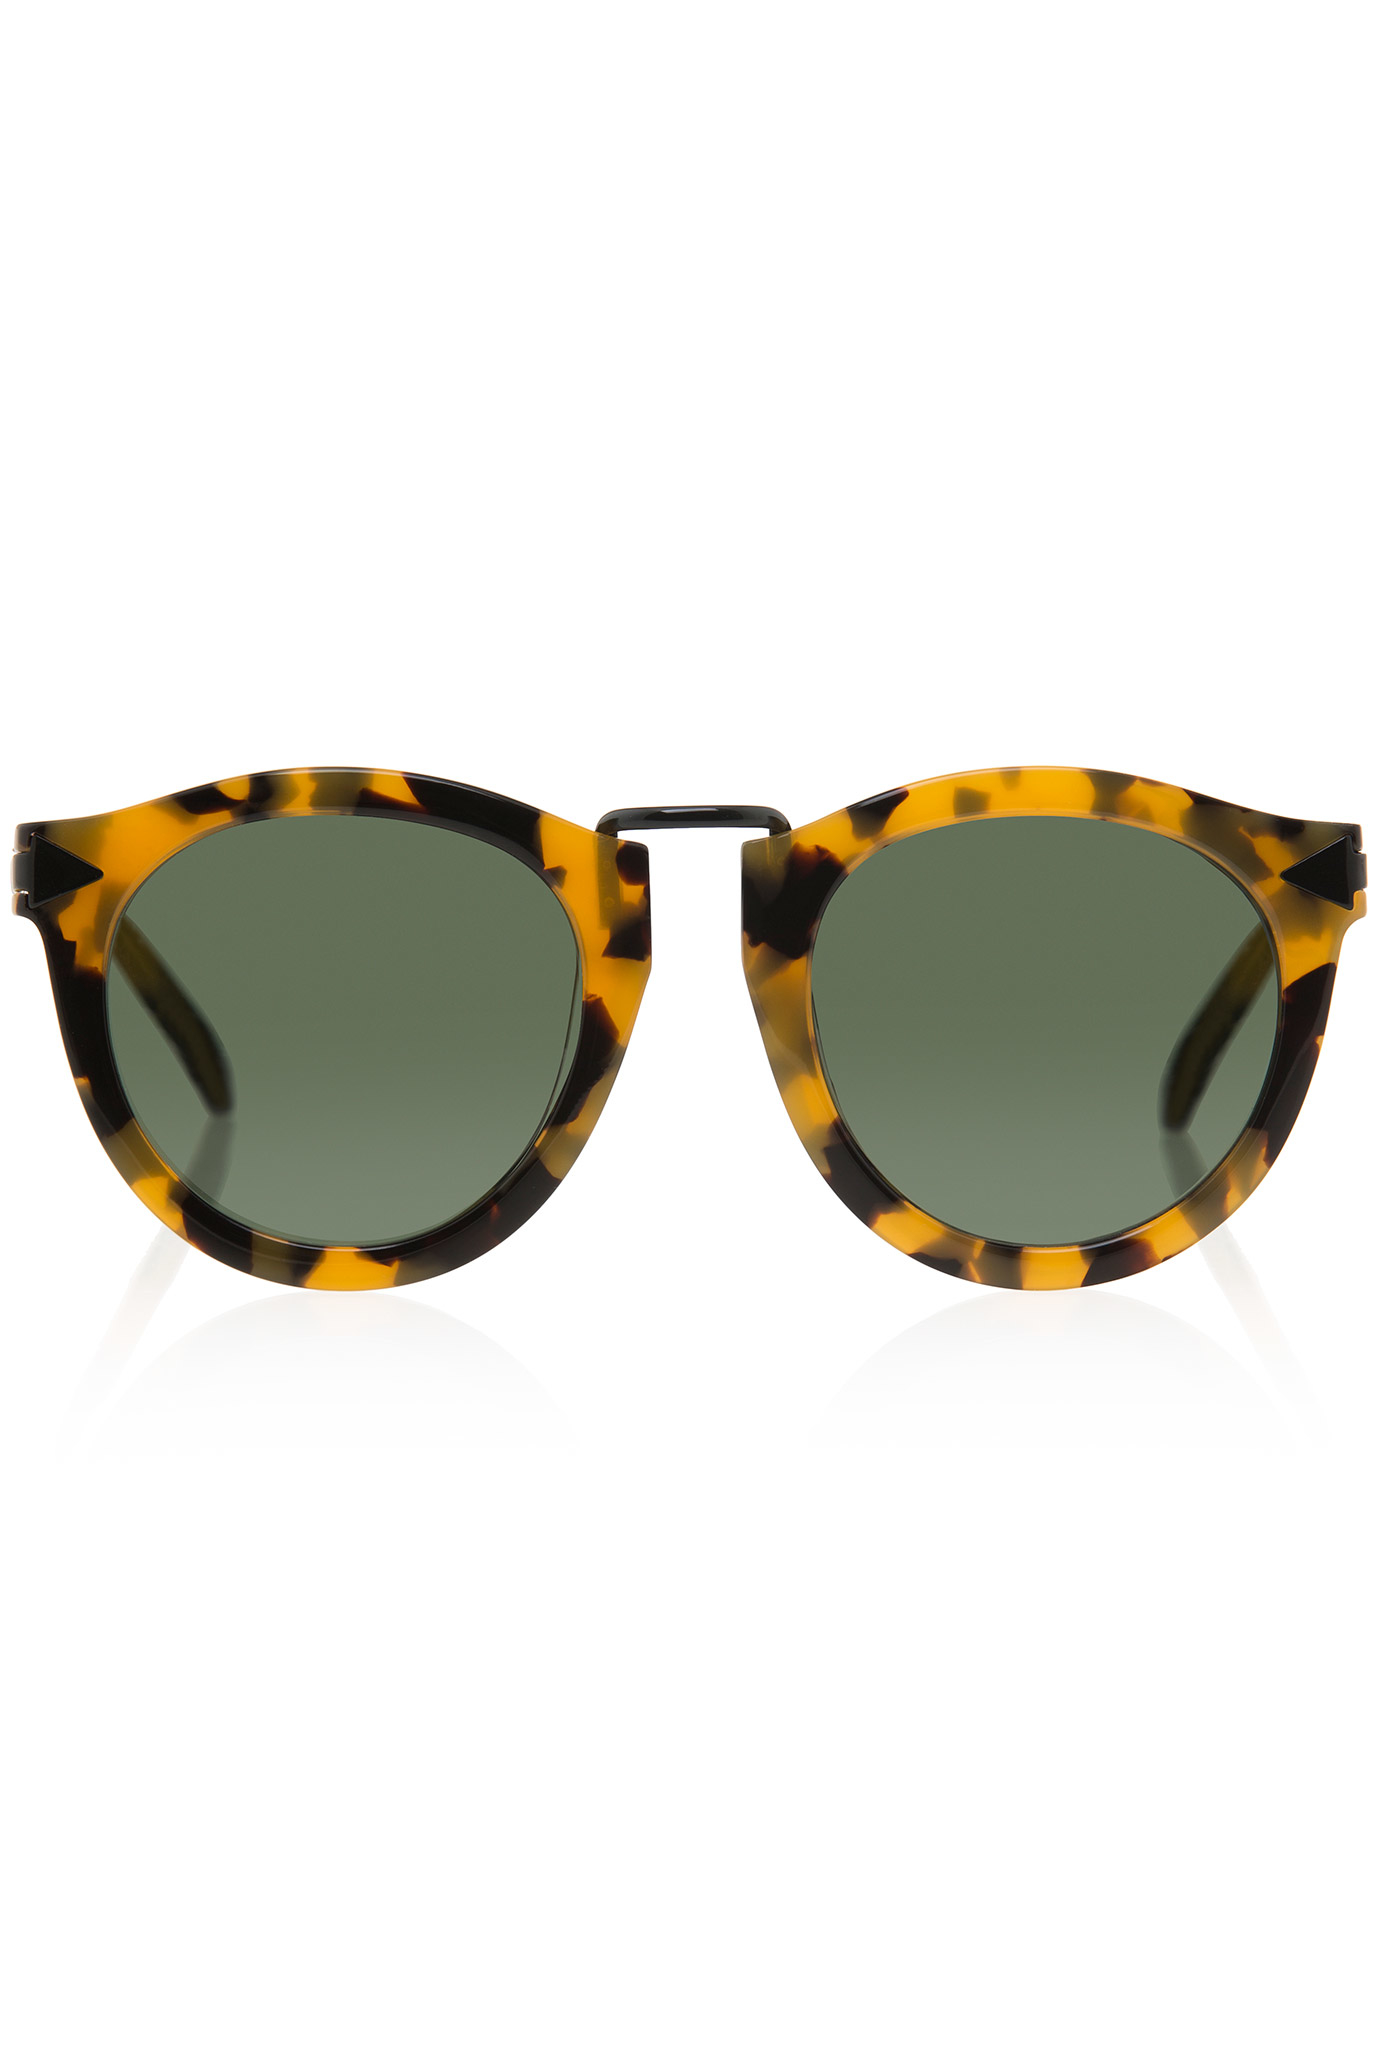 5cd403150a Karen walker Harvest Sunglasses in Green